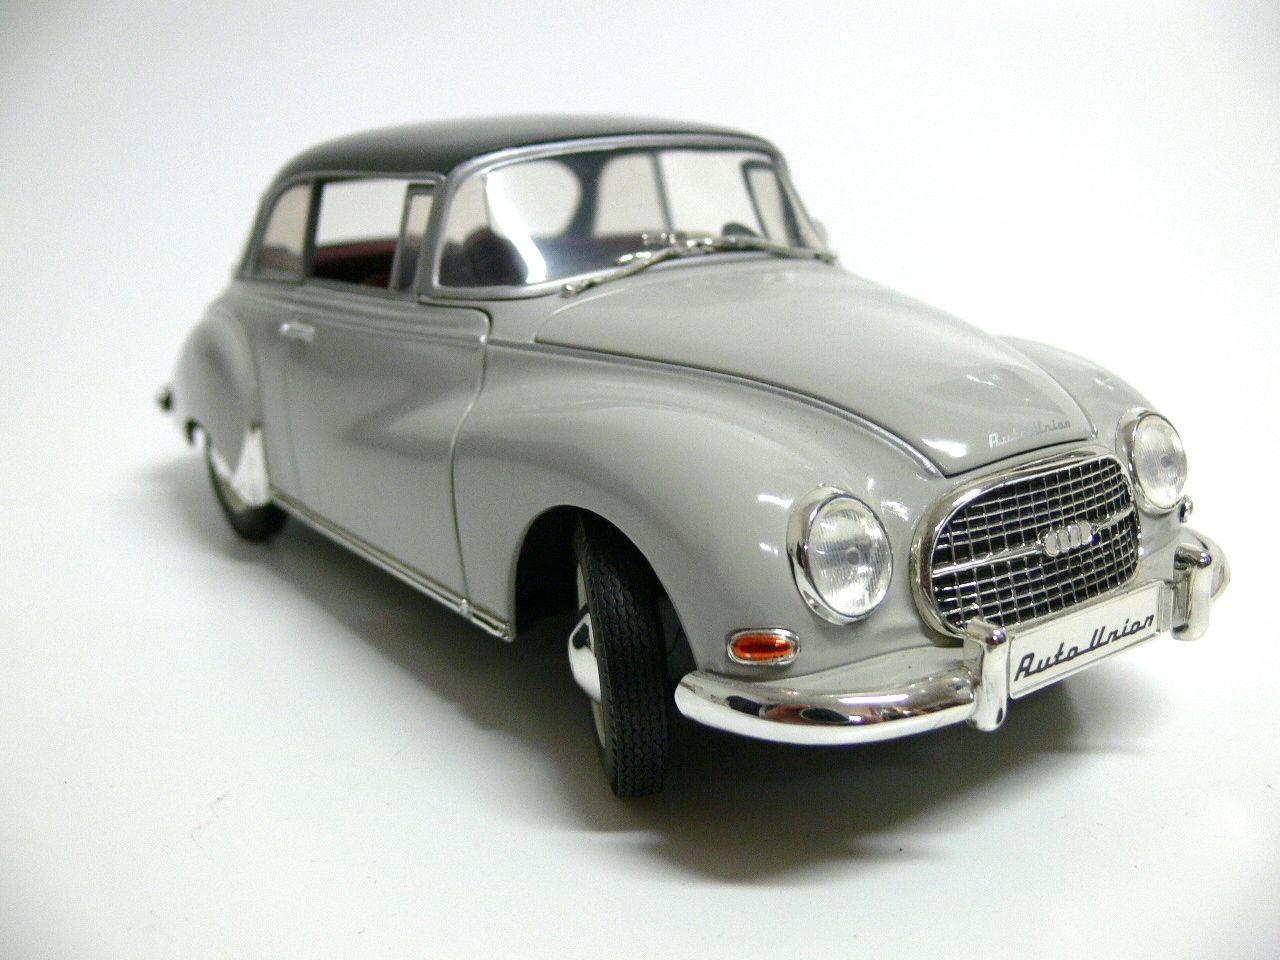 Orginal Revell Standmodell Auto Union 1000 S Farbe. Grau Am Kofferraumdeckel fehlt der Griff  $25.00